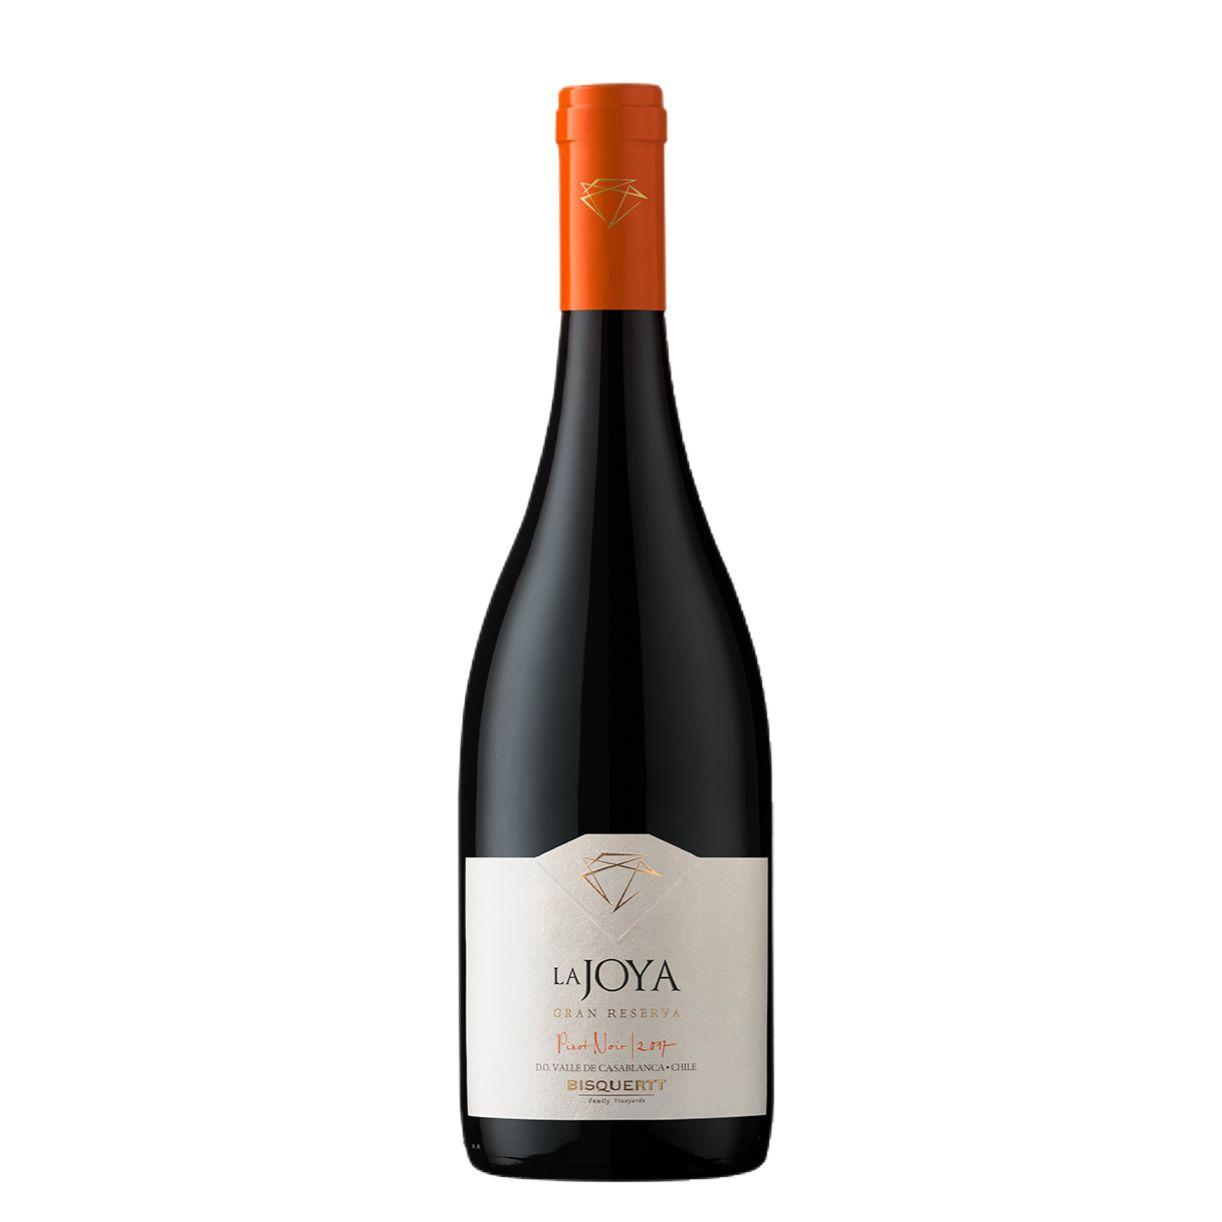 La Joya Gran Reserva Pinot Noir